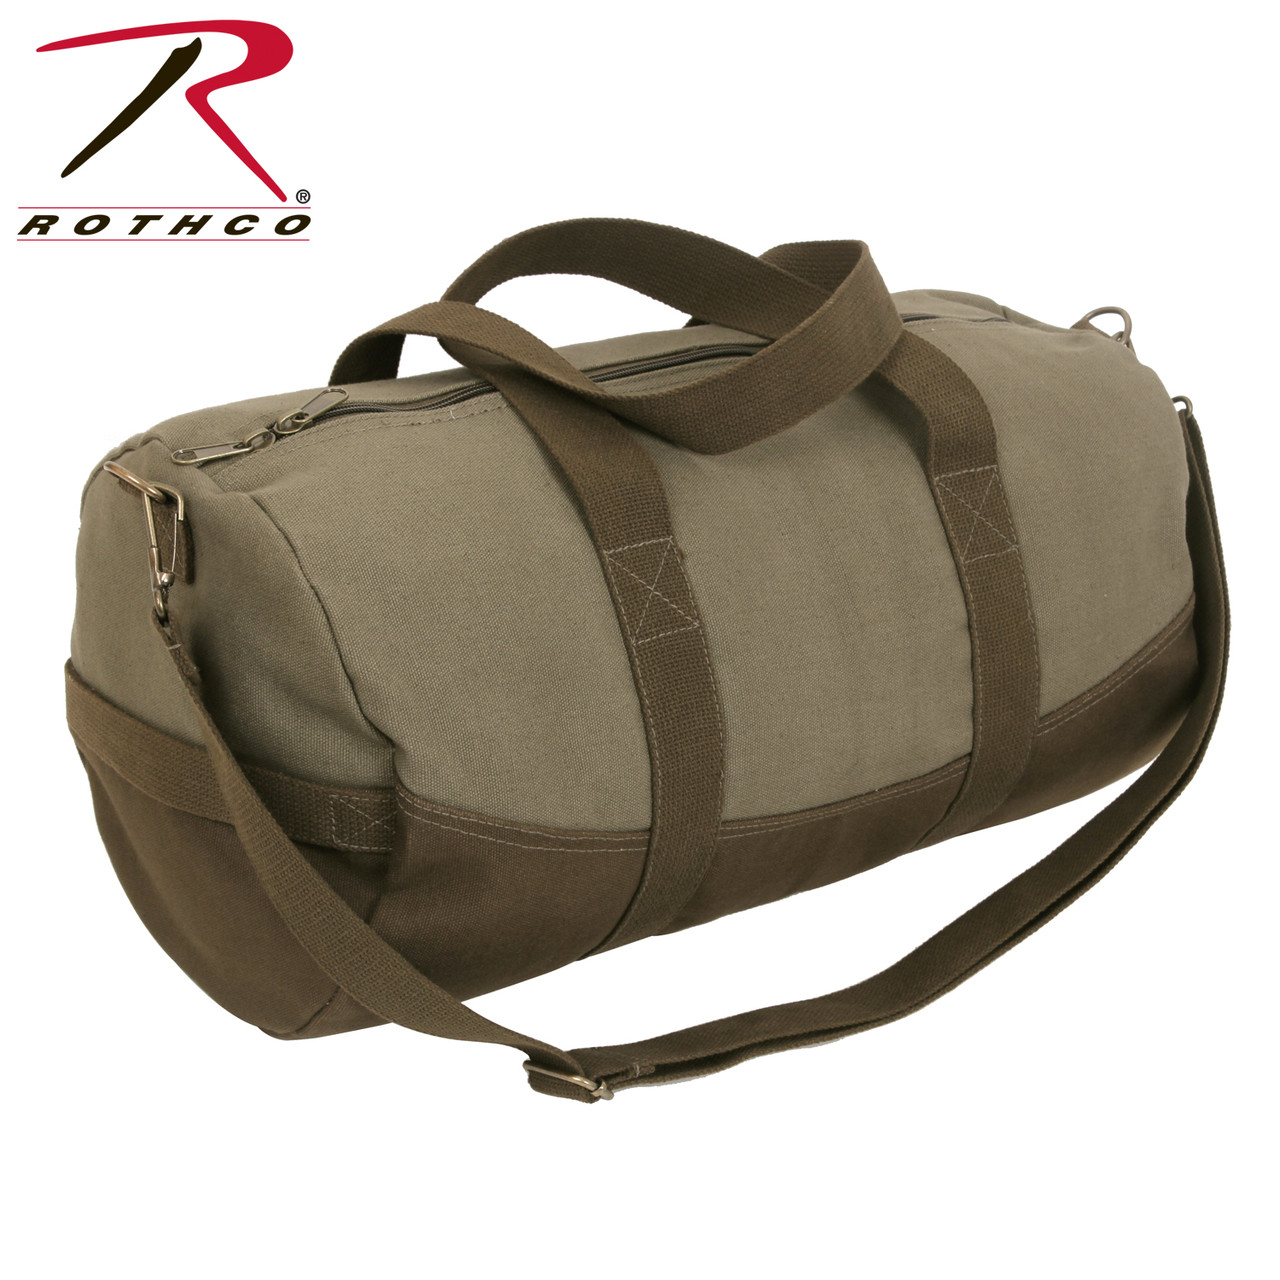 Rothco Two-Tone Canvas Duffle Bag With Brown Bottom - Hero Outdoors 358c98ea9cc33